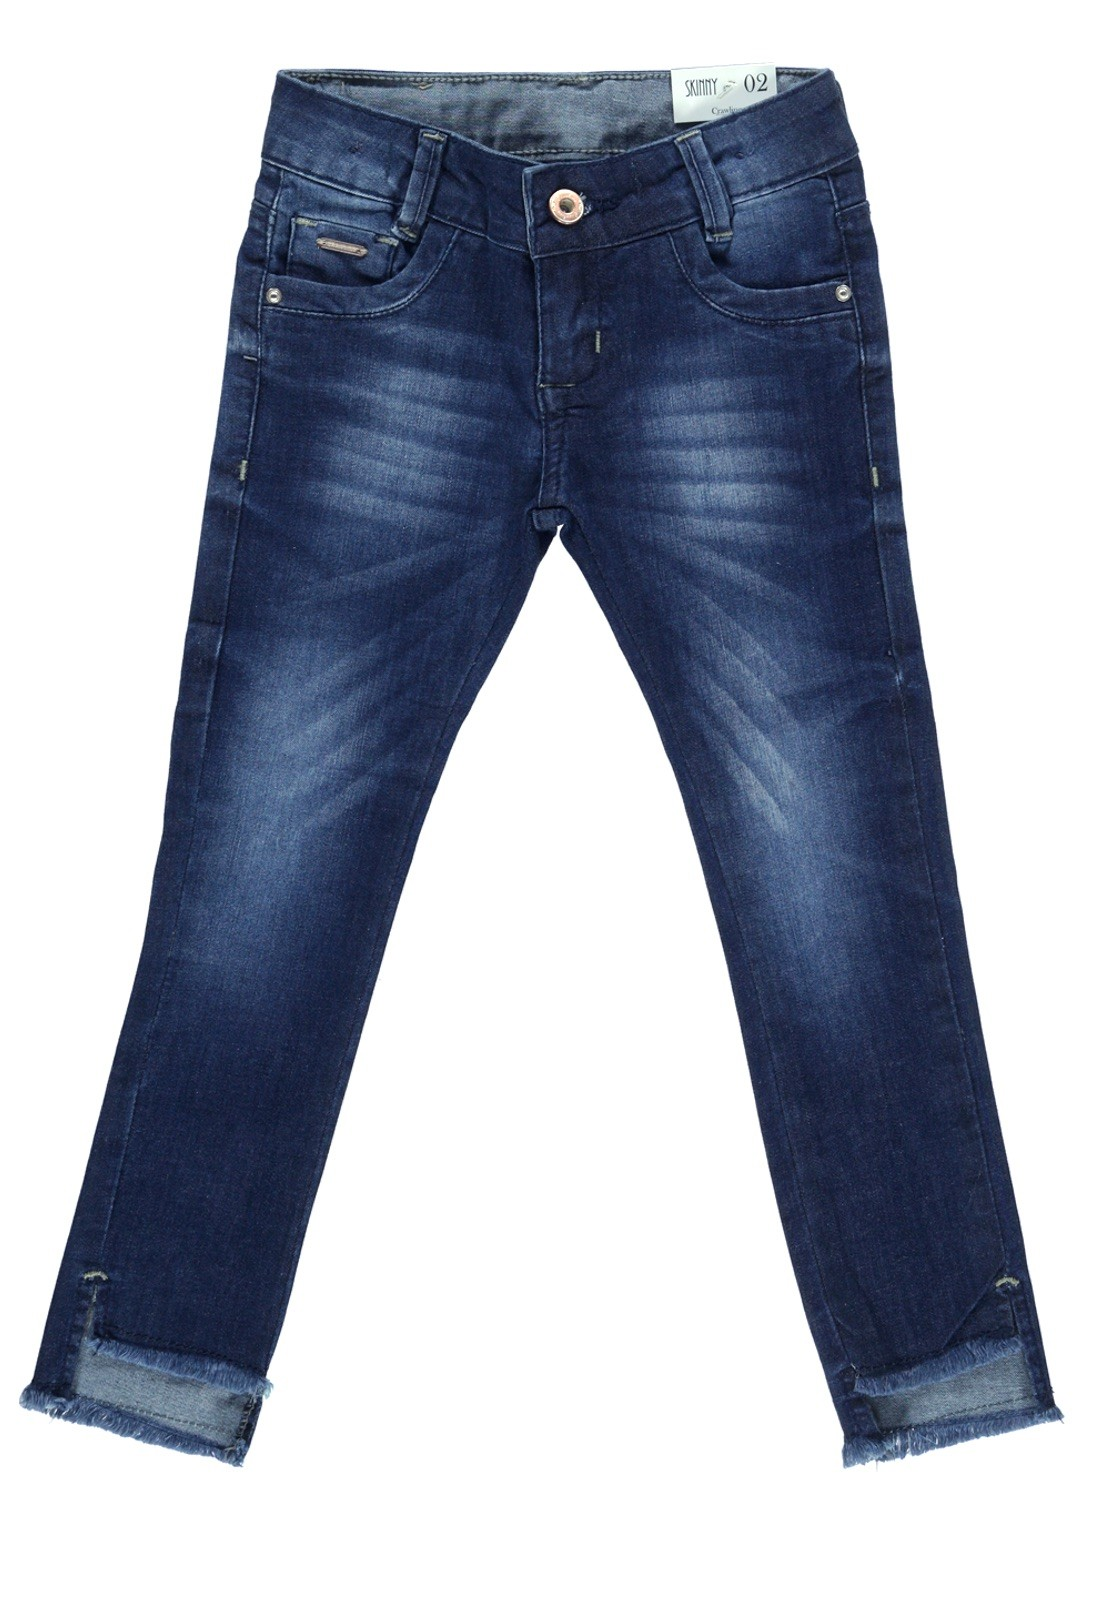 Calça Jeans Feminina Crawling Skinny Azul